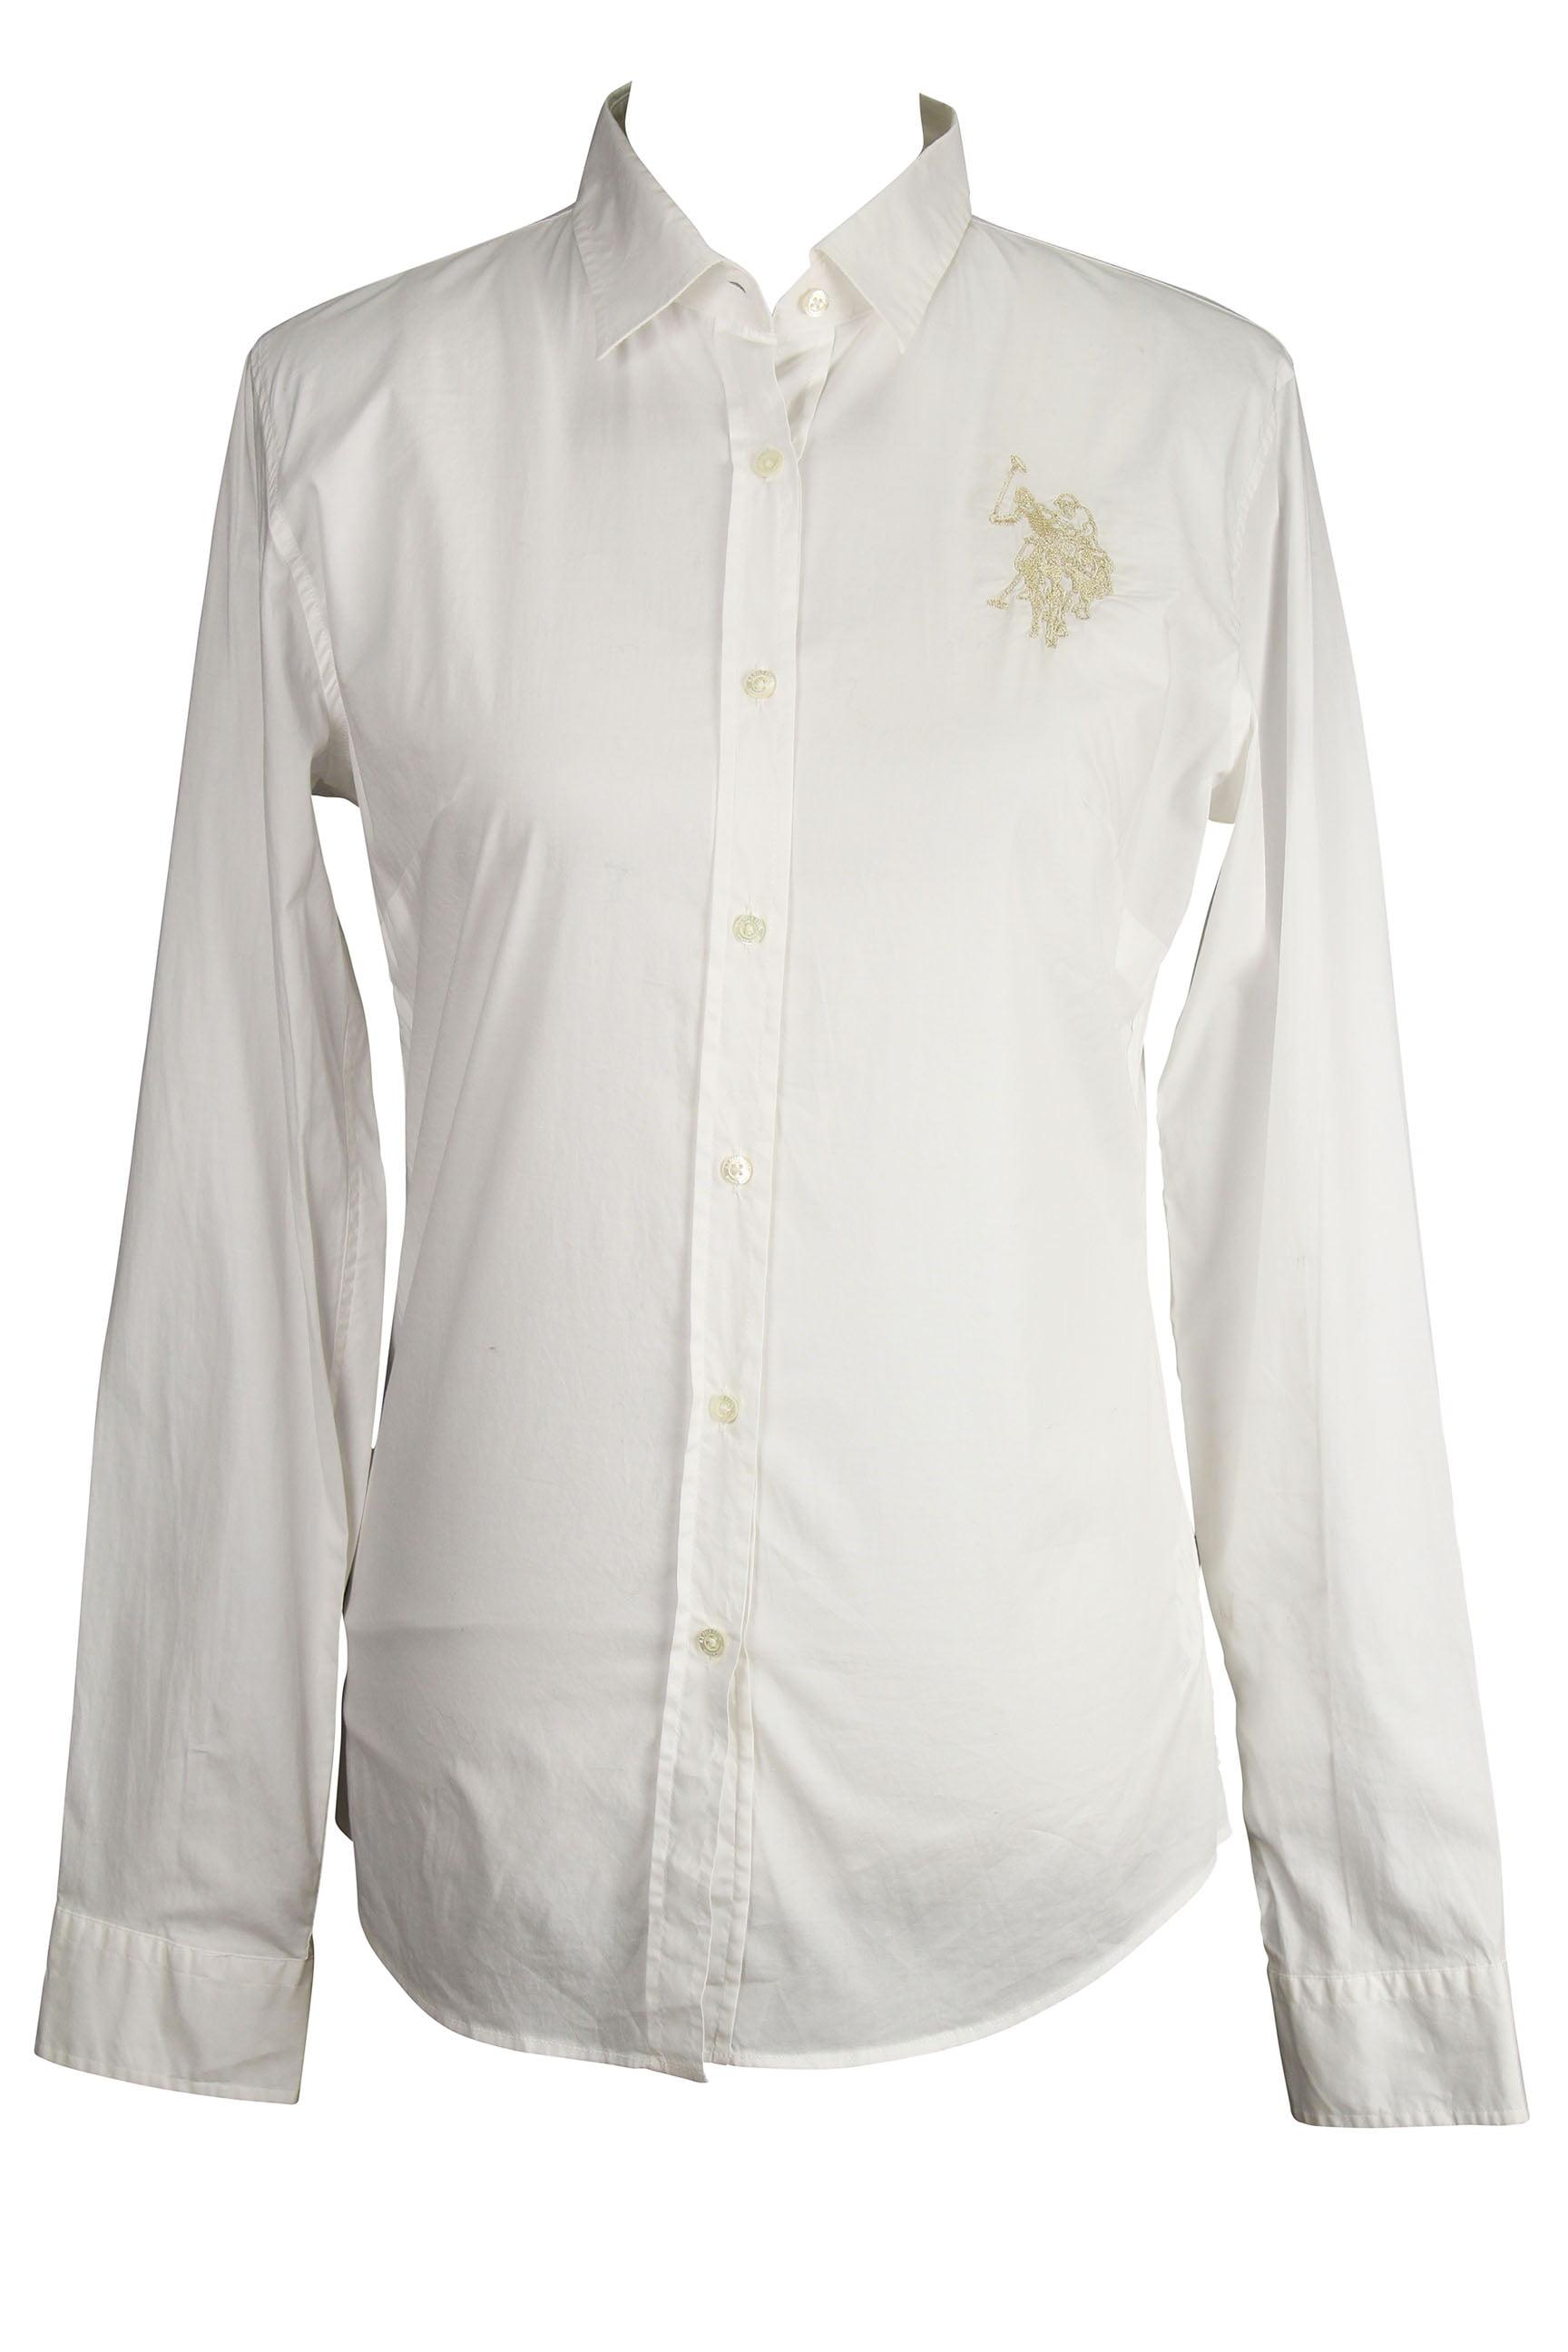 db1dab062 sweden u.s. polo assn. long sleeve womens button down shirt size l us  walmart 6ddea